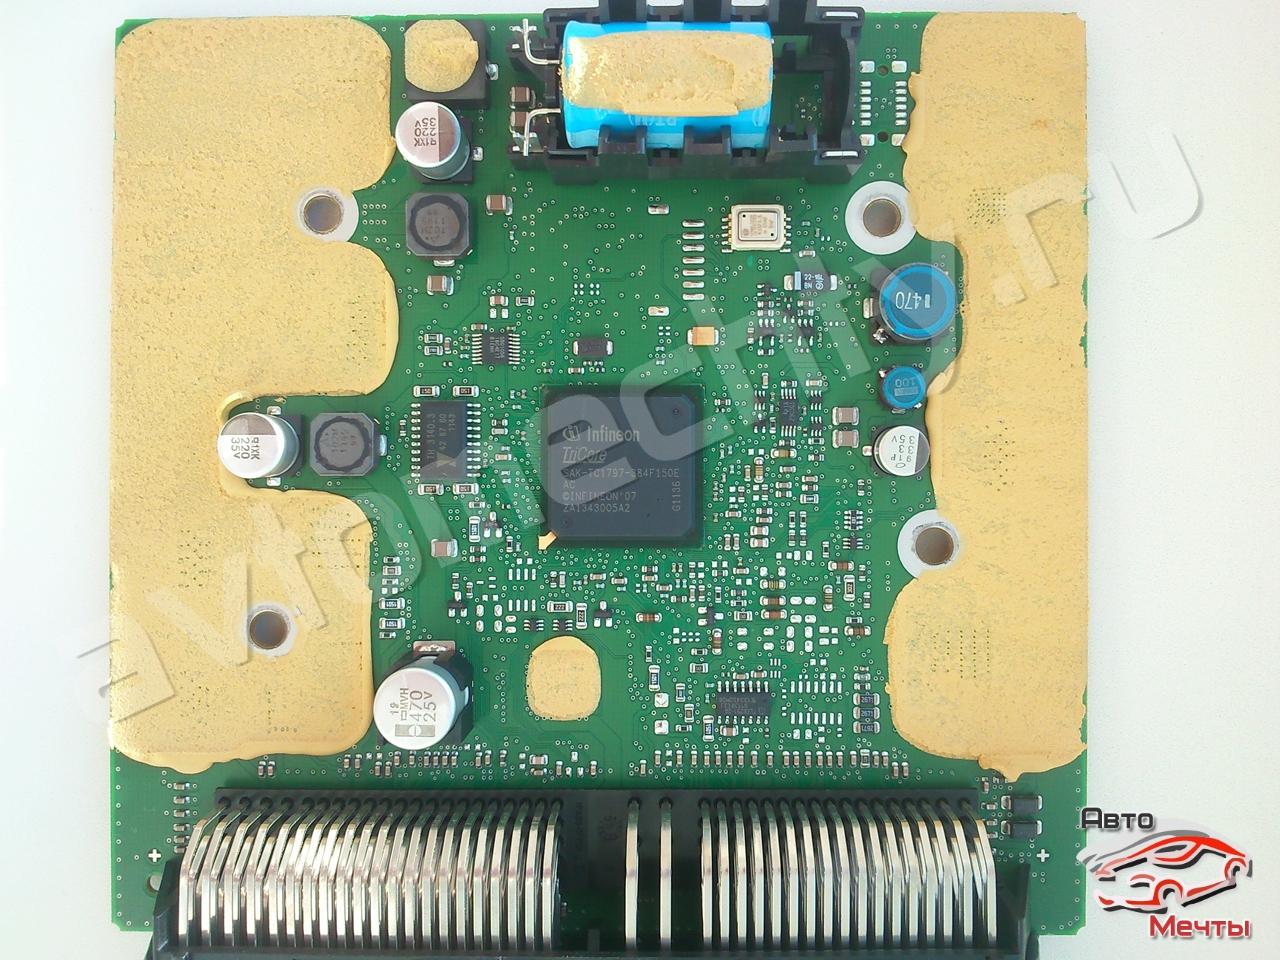 Печатная плата Continental Simos 12.1 с процессором TC1797 семейства TriCore